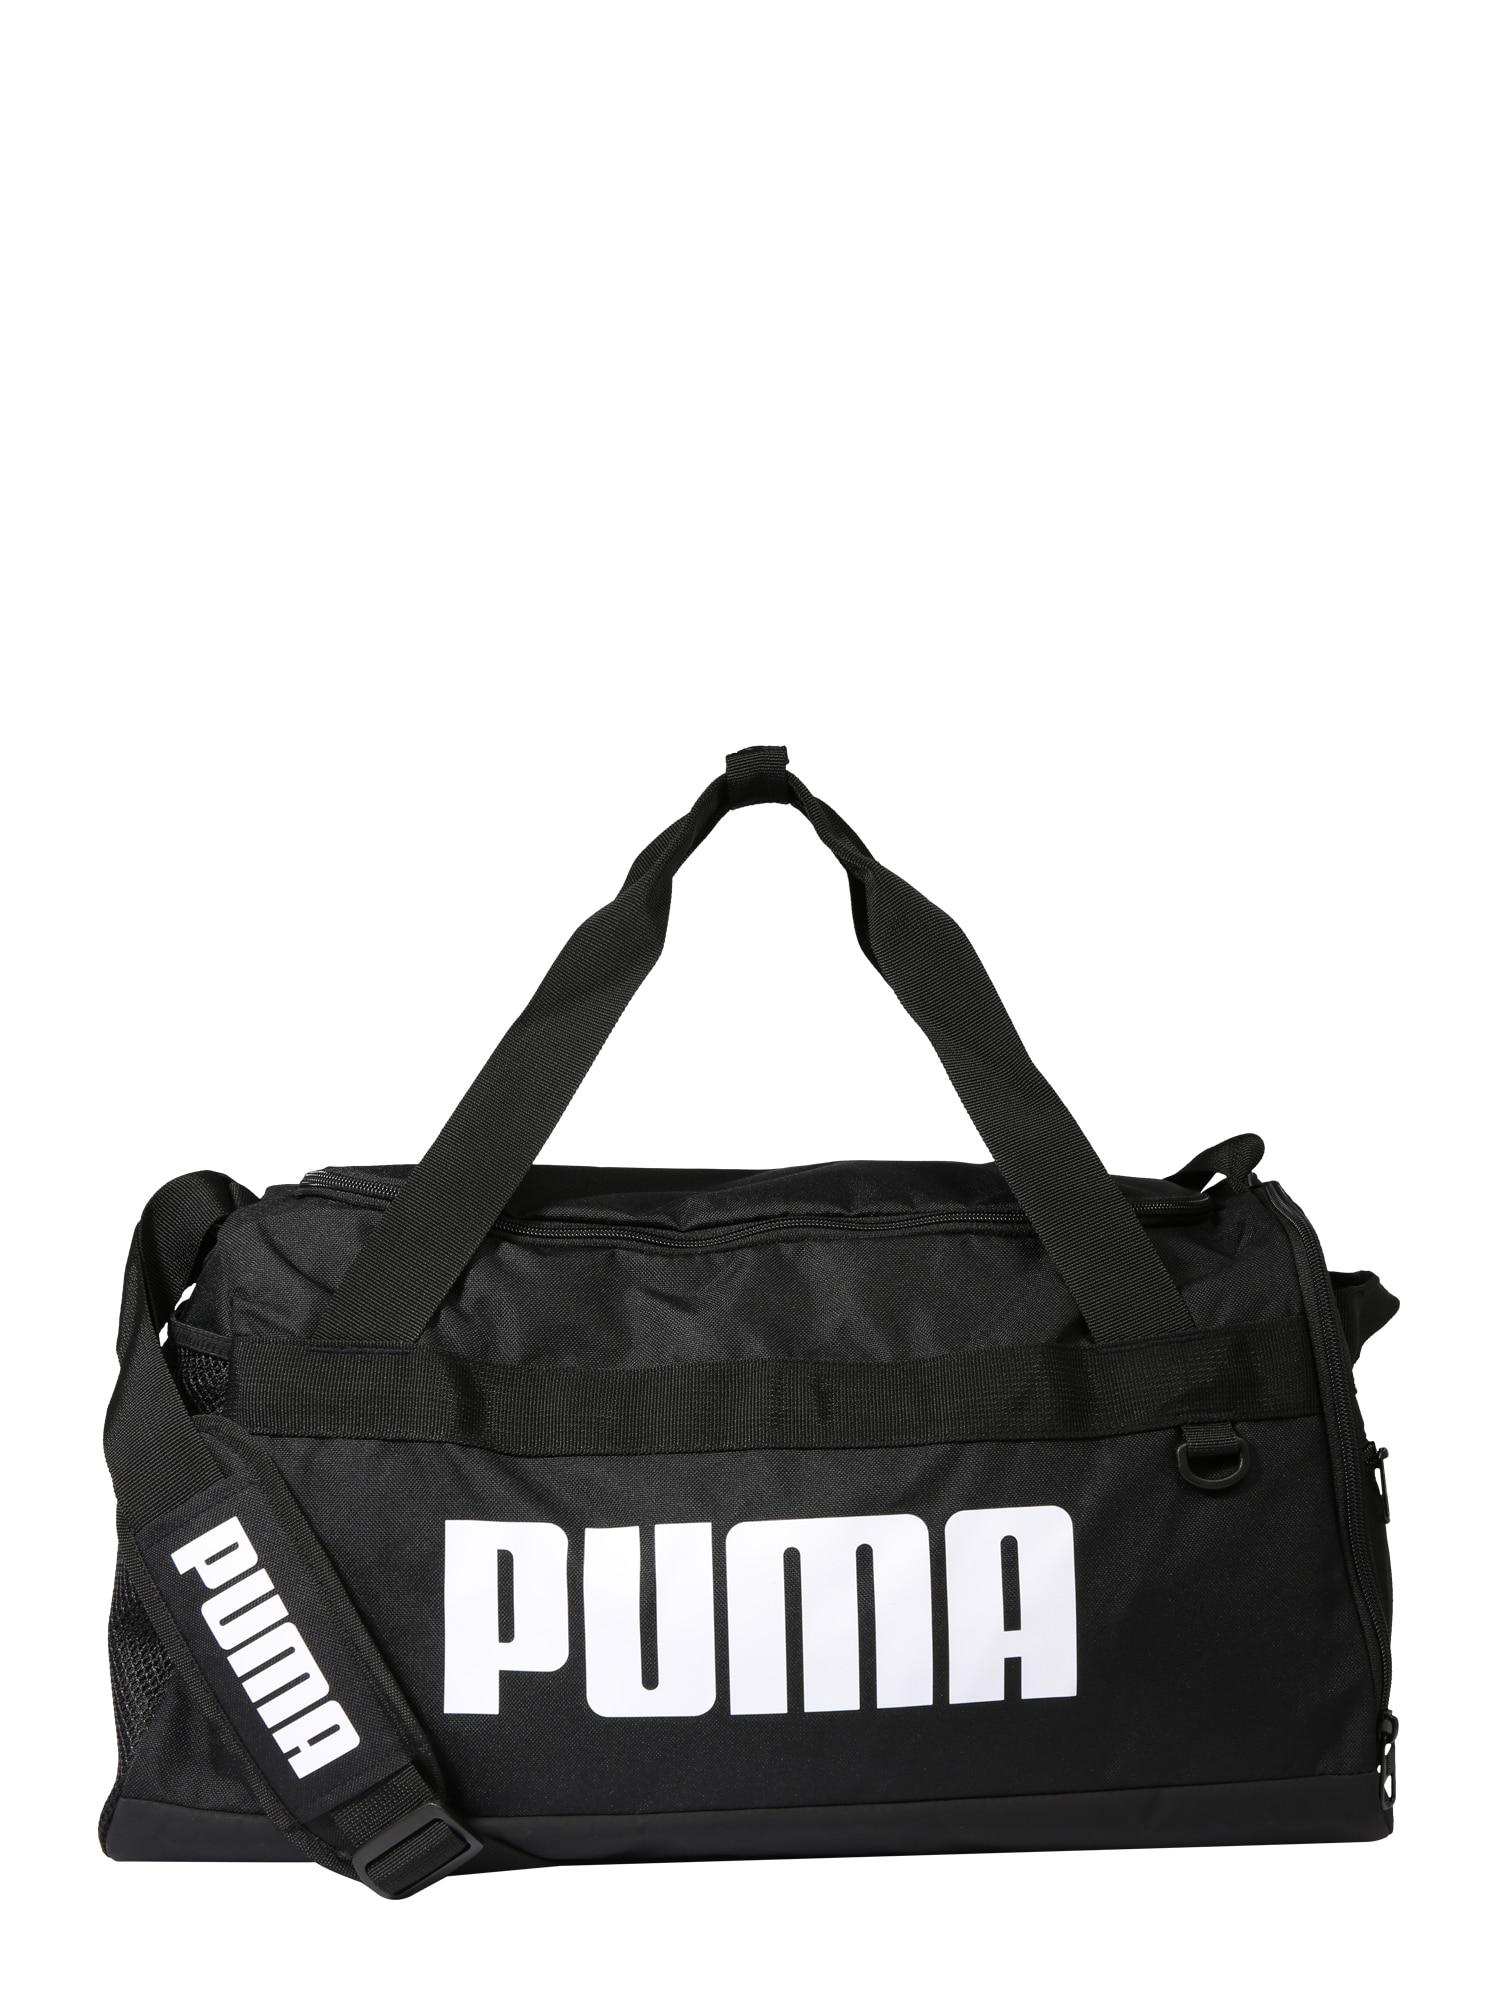 Sportovní taška Challenger Duffel černá bílá PUMA